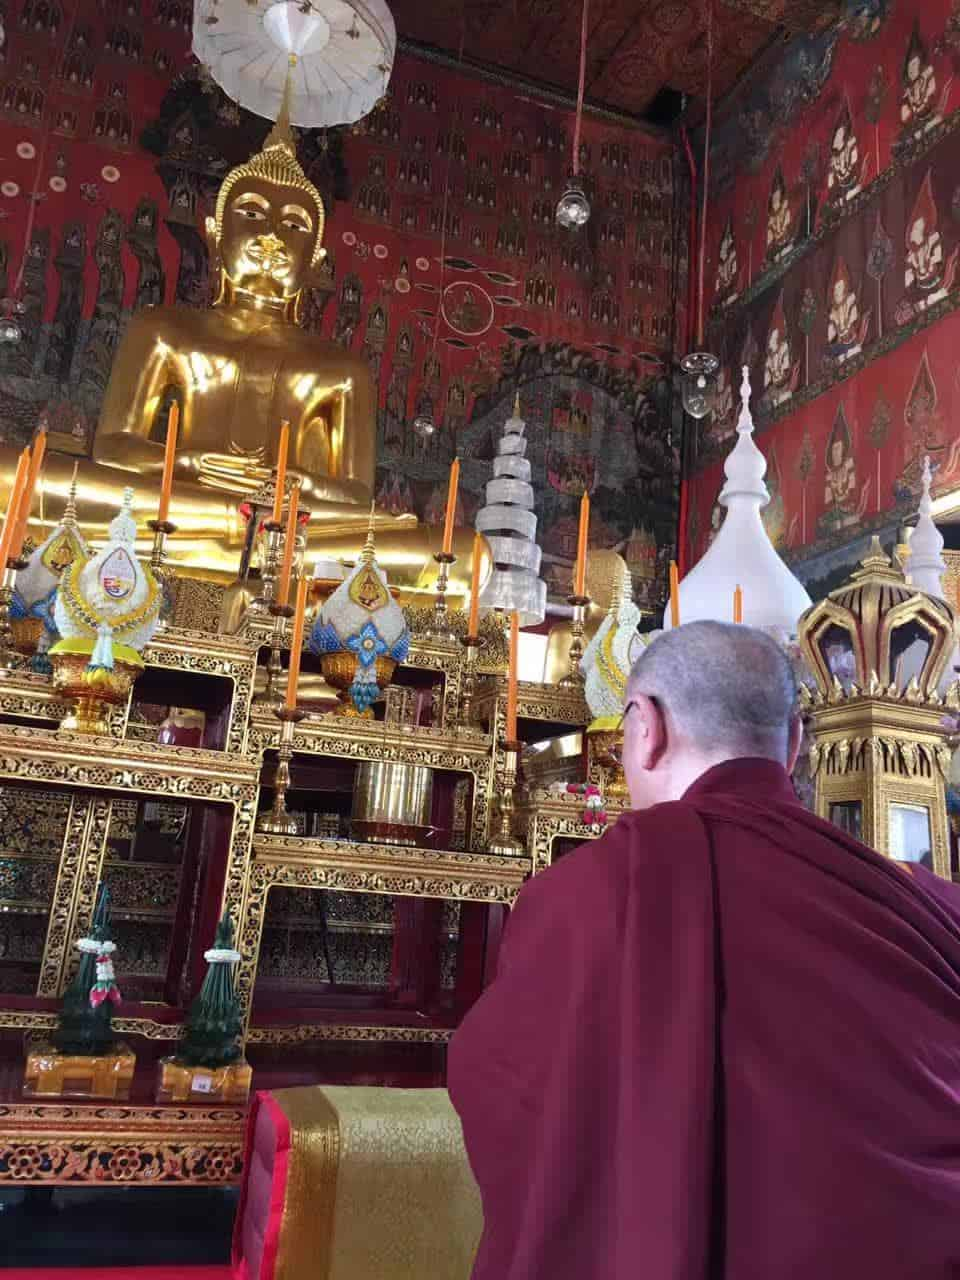 Gosok Rinpoche Thailand 2017 T029 0b64a4b575b6cbaa0cd1589fccc02c8